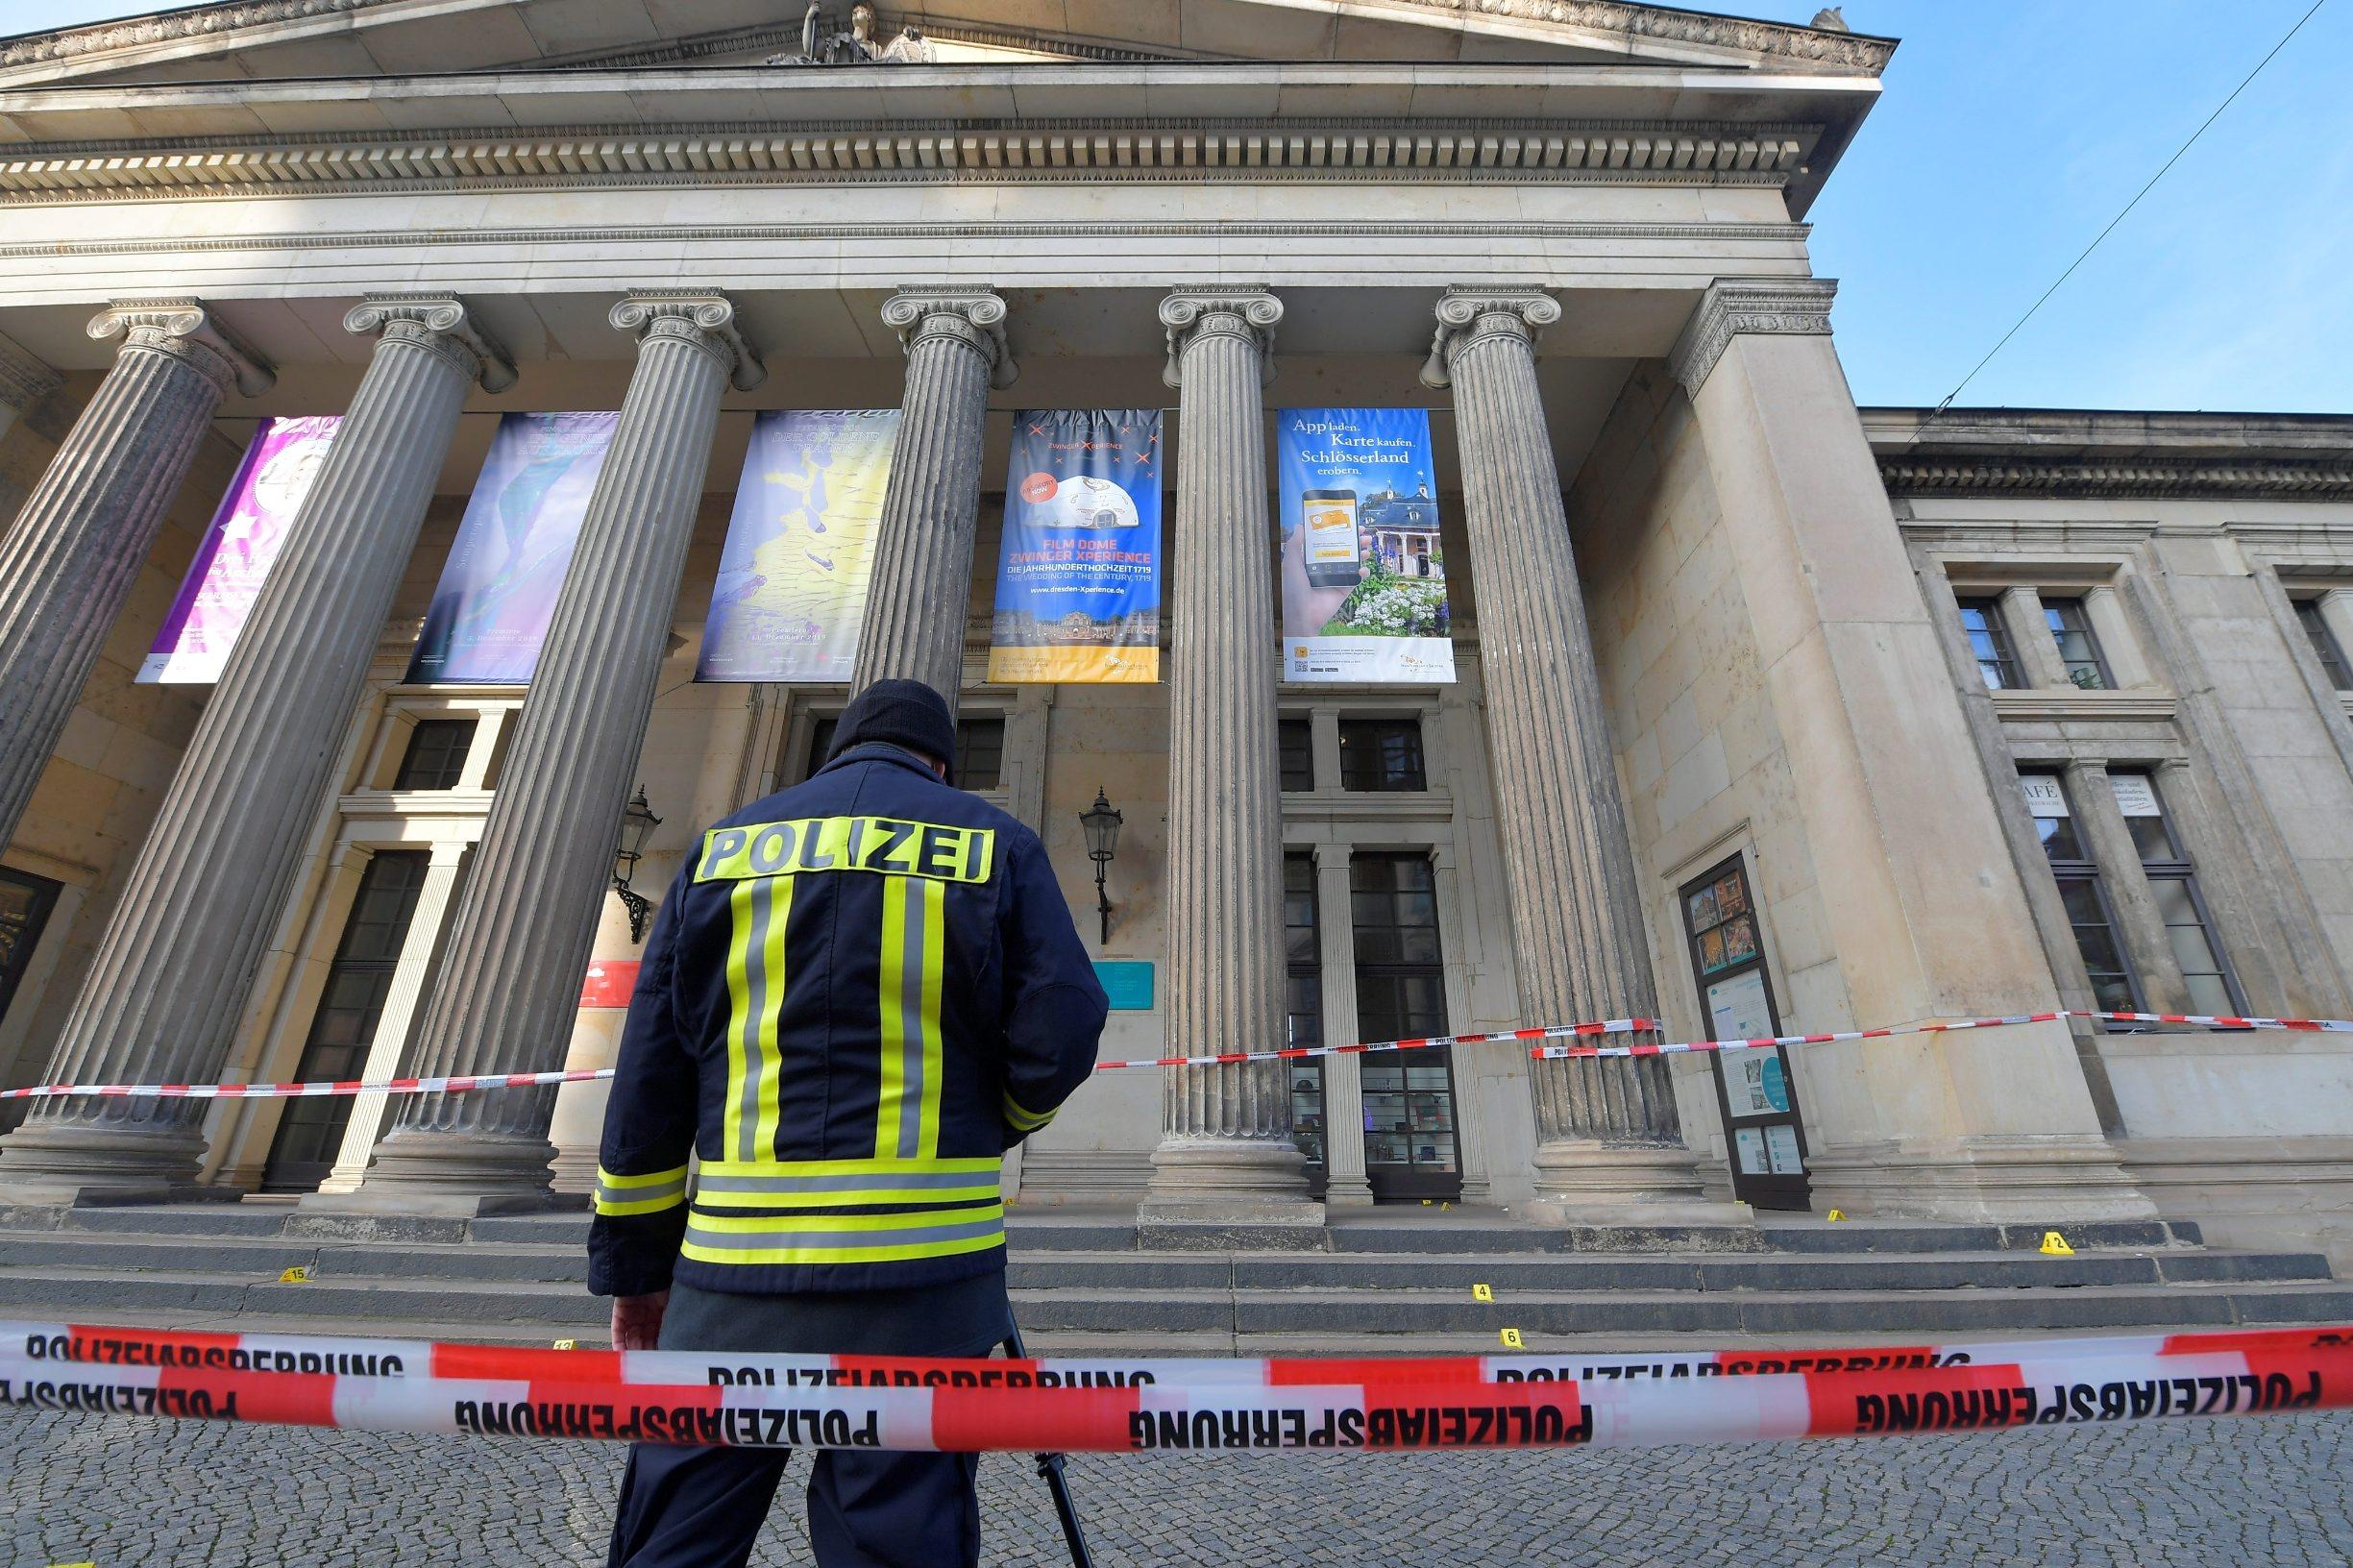 Policajac ispred muzeja Zelena riznica u Dresdenu